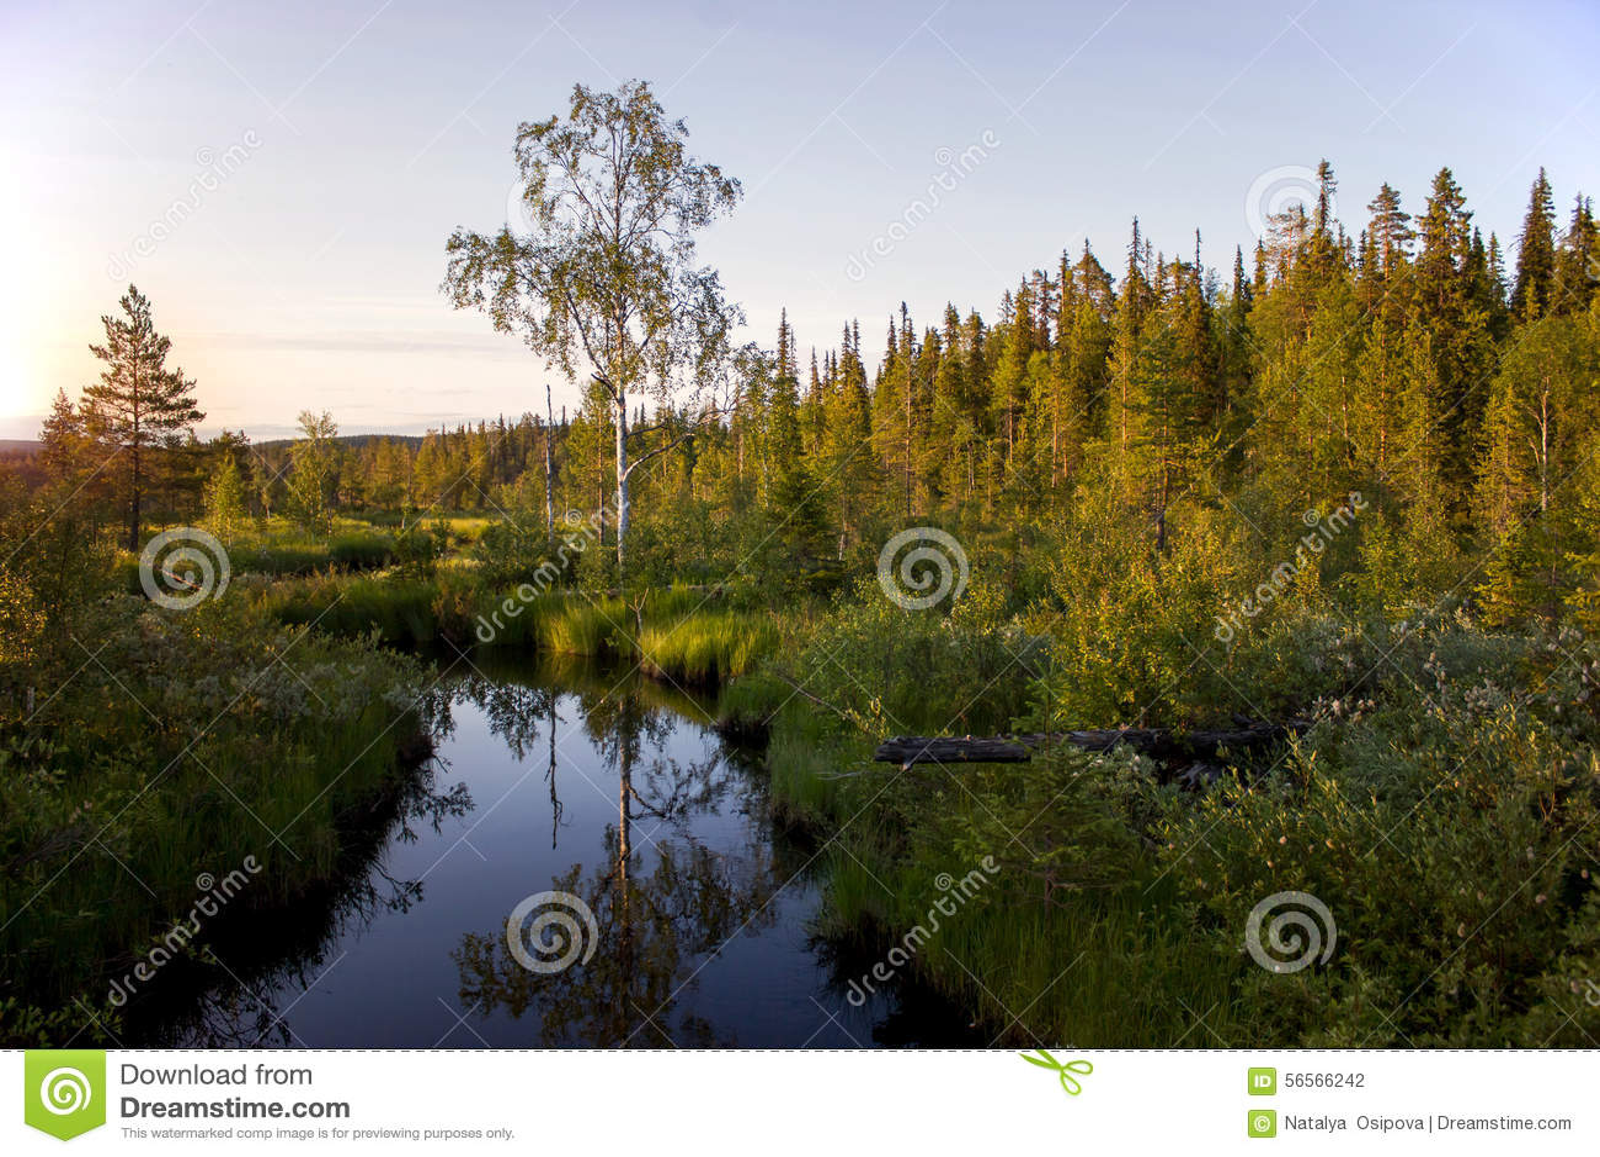 Download Θερινό ηλιοβασίλεμα στην καρελιανή δασική Ρωσία Στοκ Εικόνες - εικόνα από έδαφος, αλιεία: 56566242